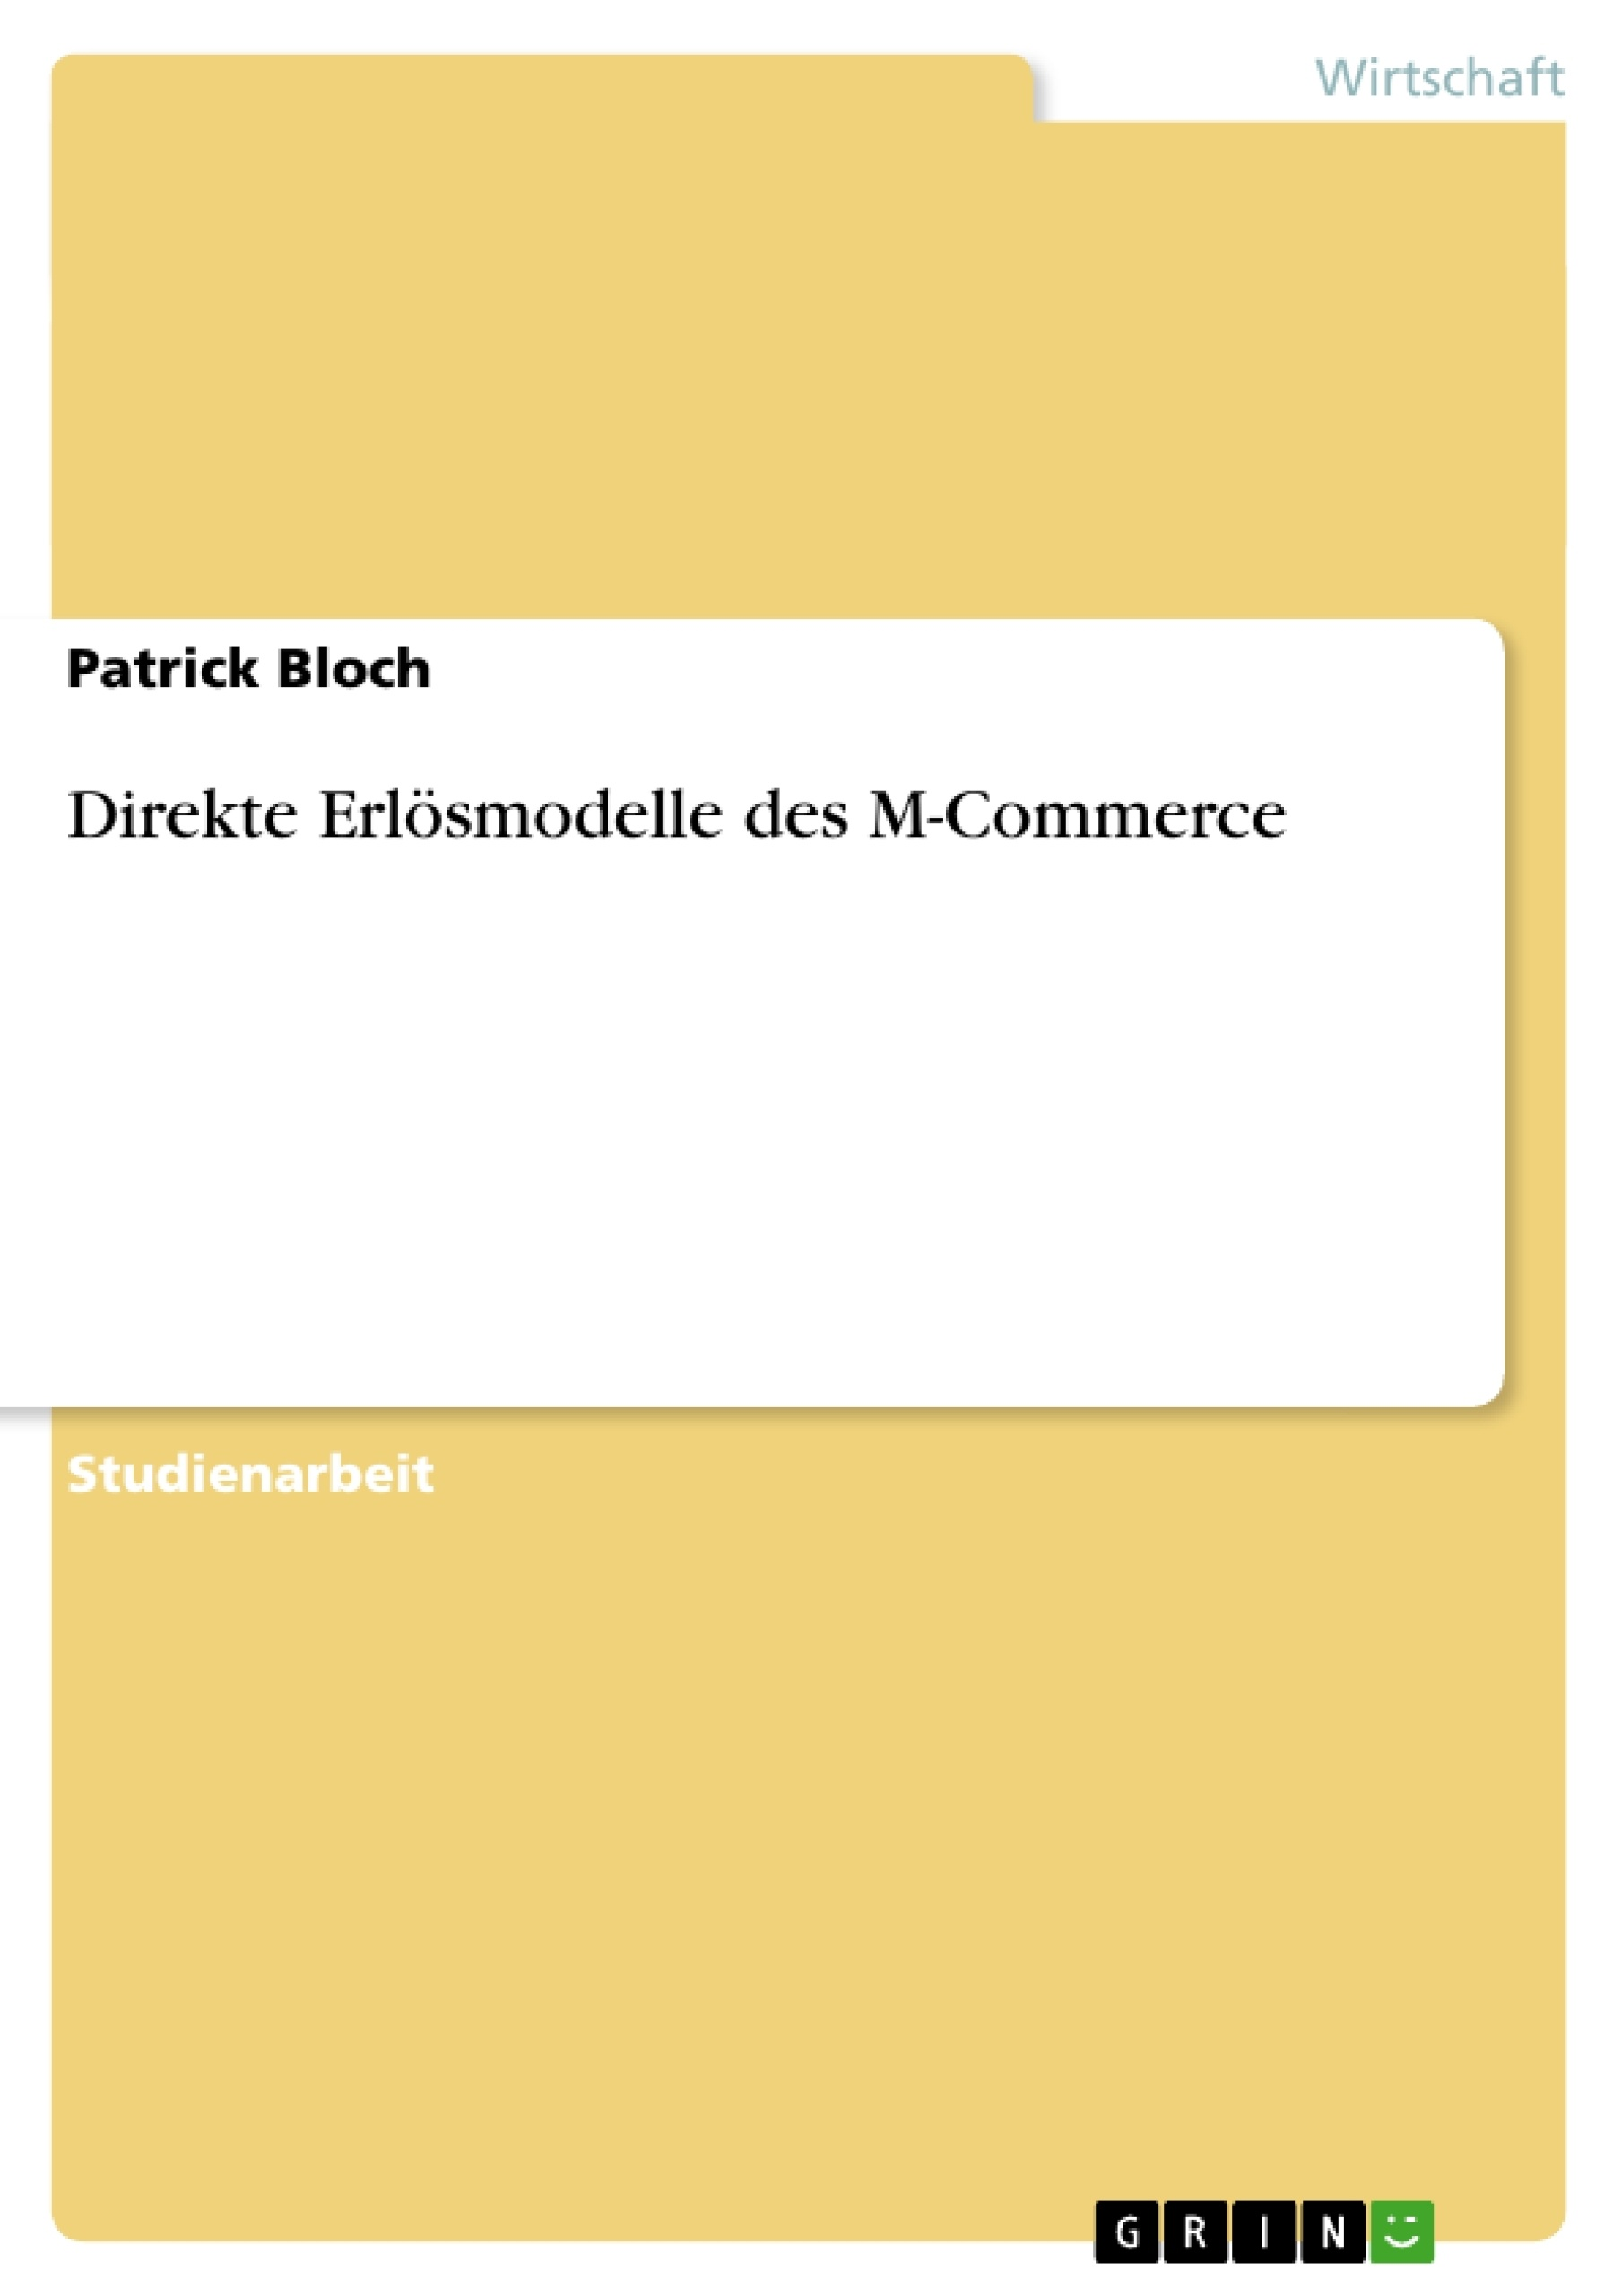 Titel: Direkte Erlösmodelle des M-Commerce